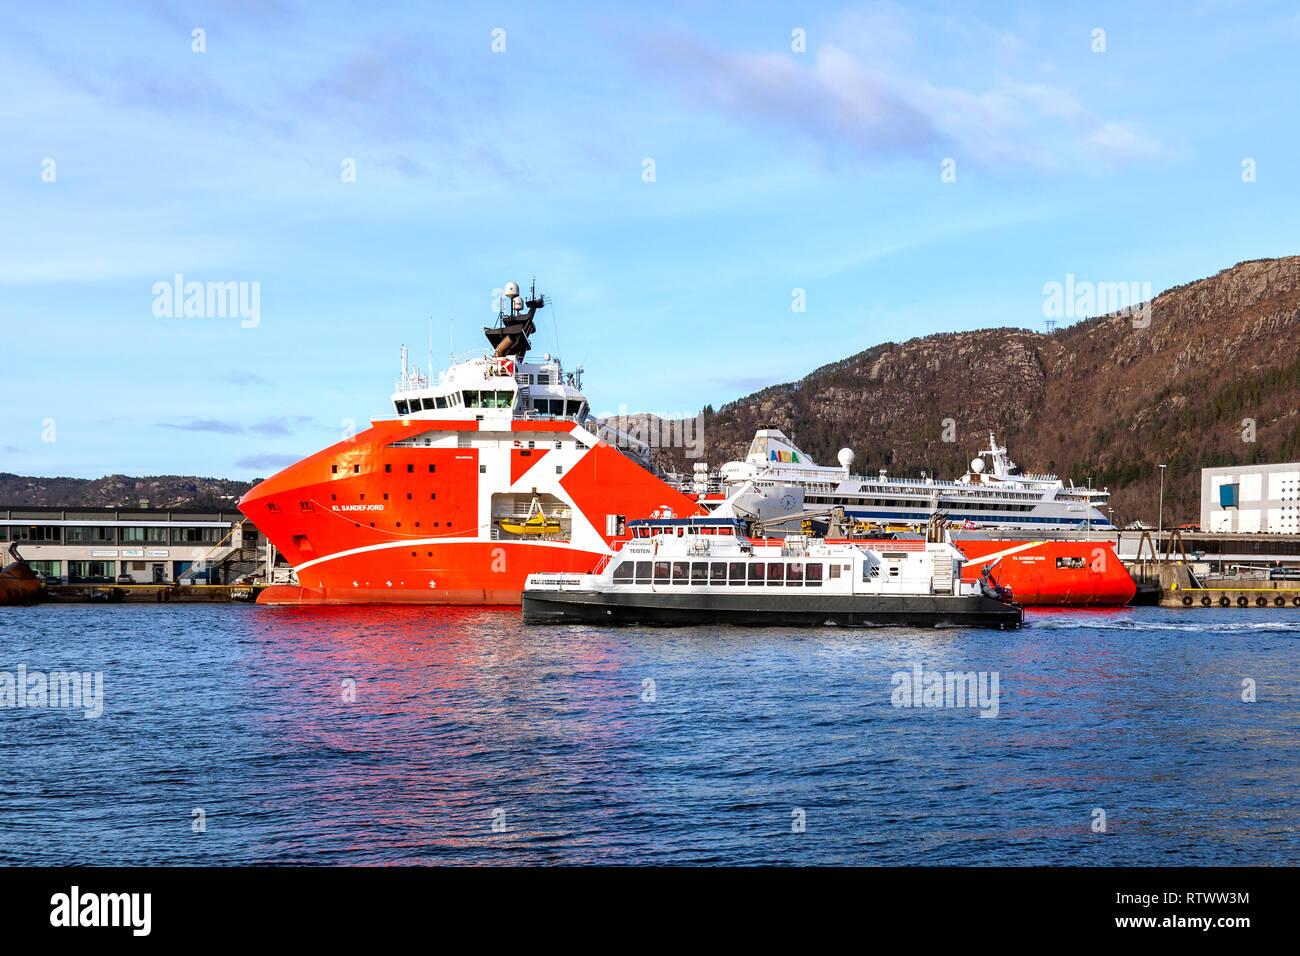 High speed passenger catamaran Teisten departing from the port of Bergen, Norway. Passing offshore supply vessel KL Sandefjord on it's way - Stock Image